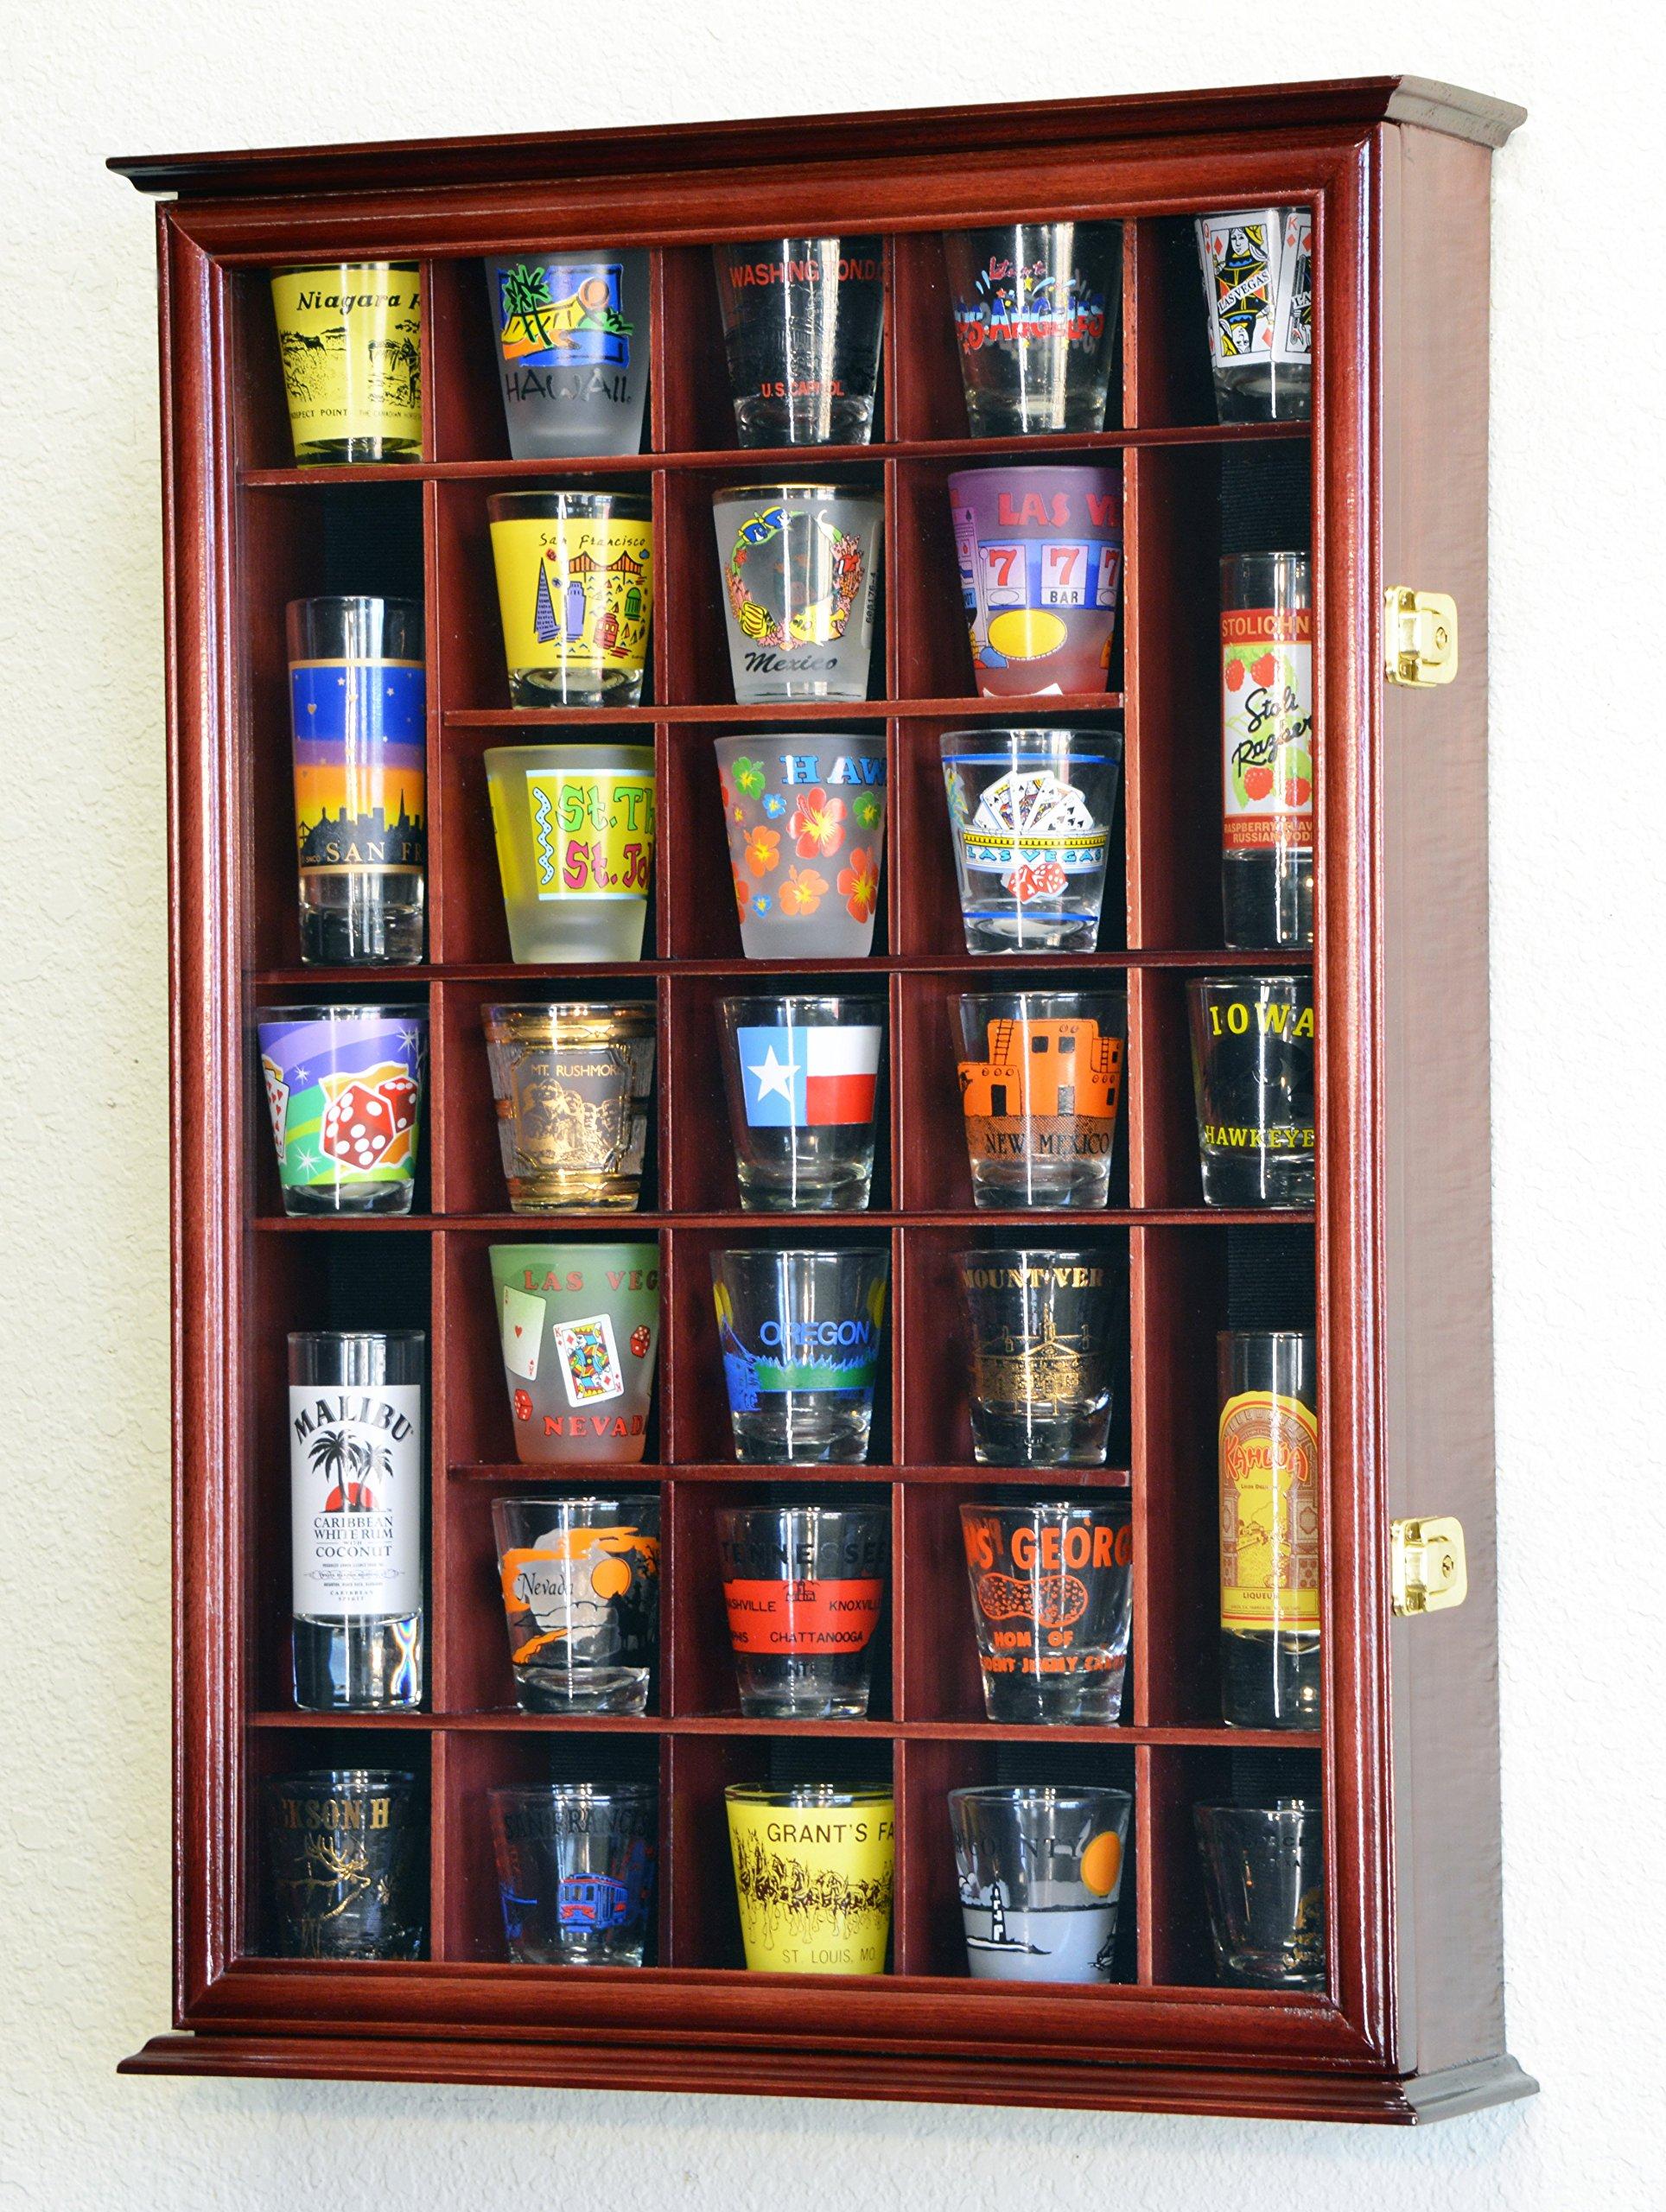 31 Shot Glass Shotglass Shooter Display Case Holder Cabinet Wall Rack -Cherry